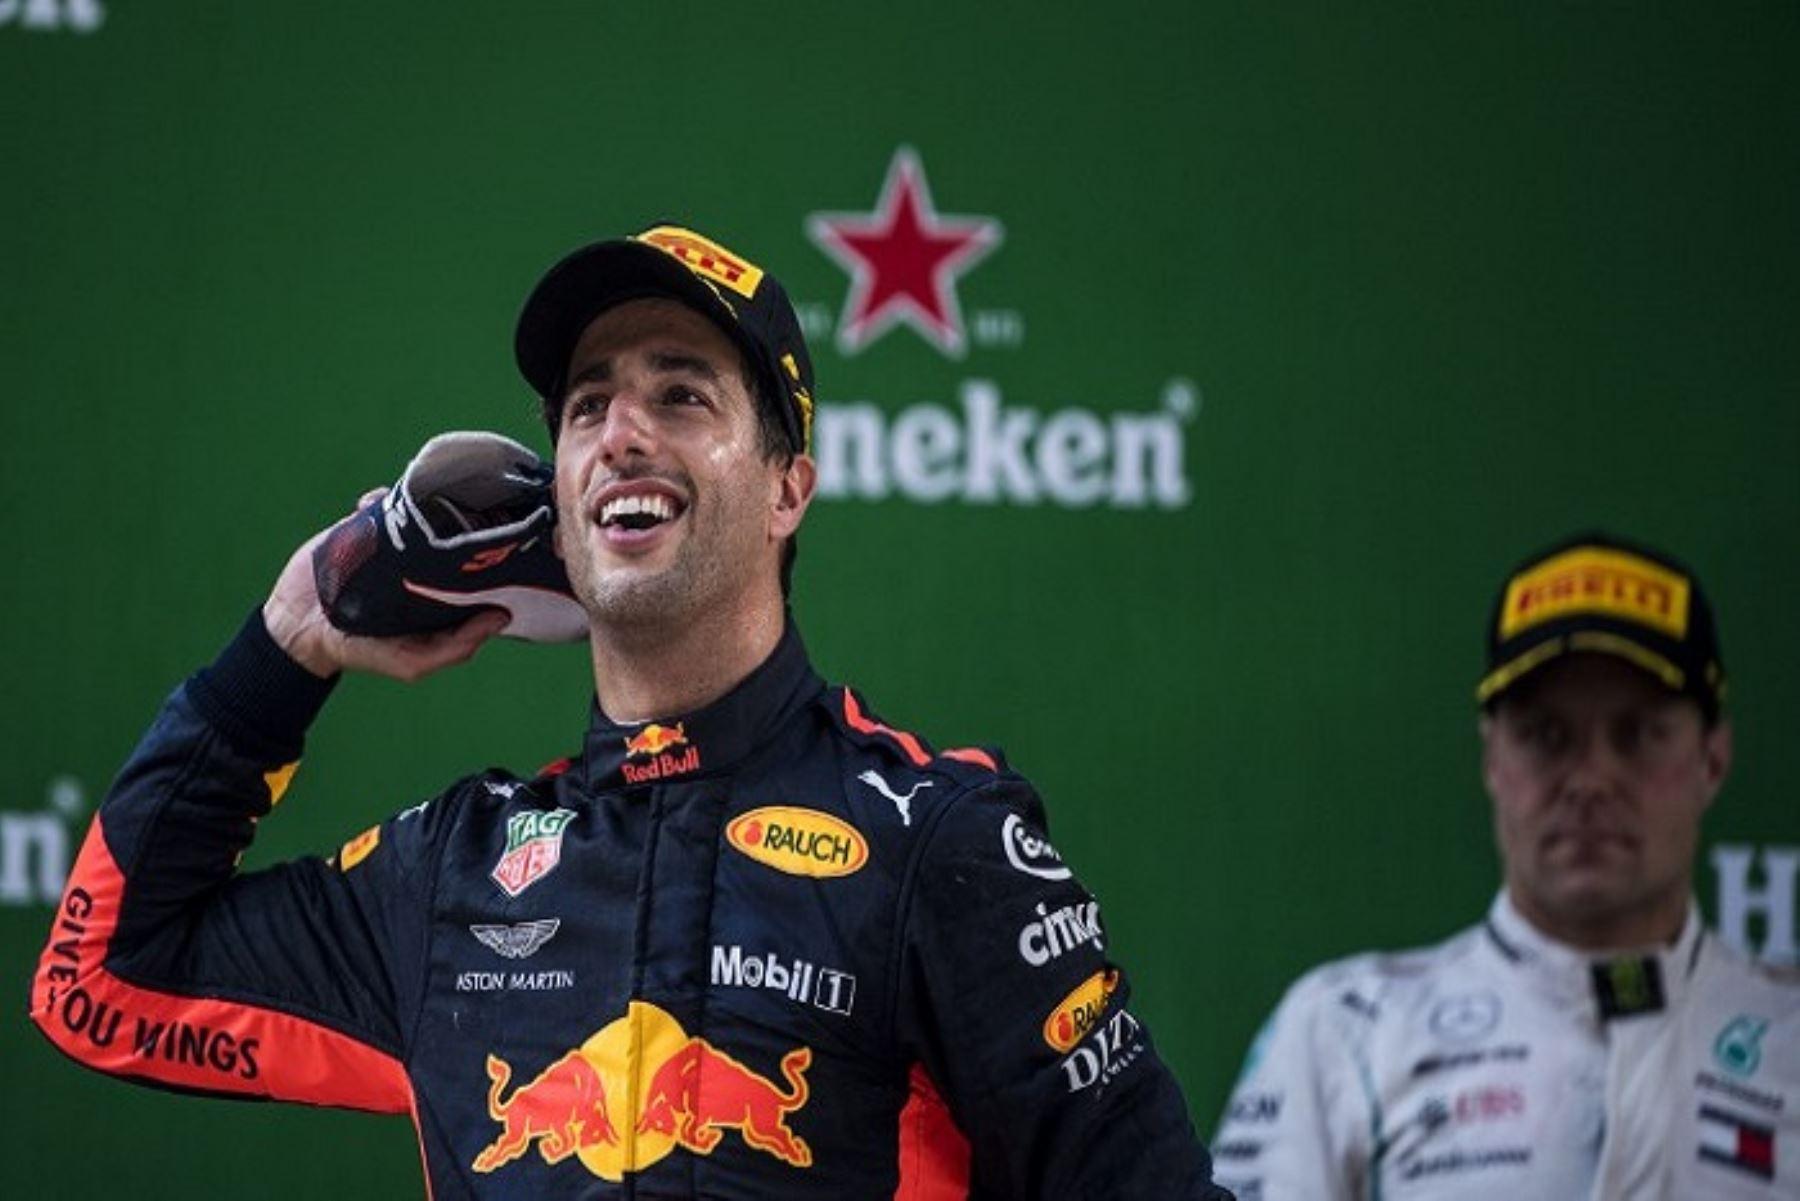 El australiano Ricciardo (Red Bull) gana el Gran Premio de China de F1